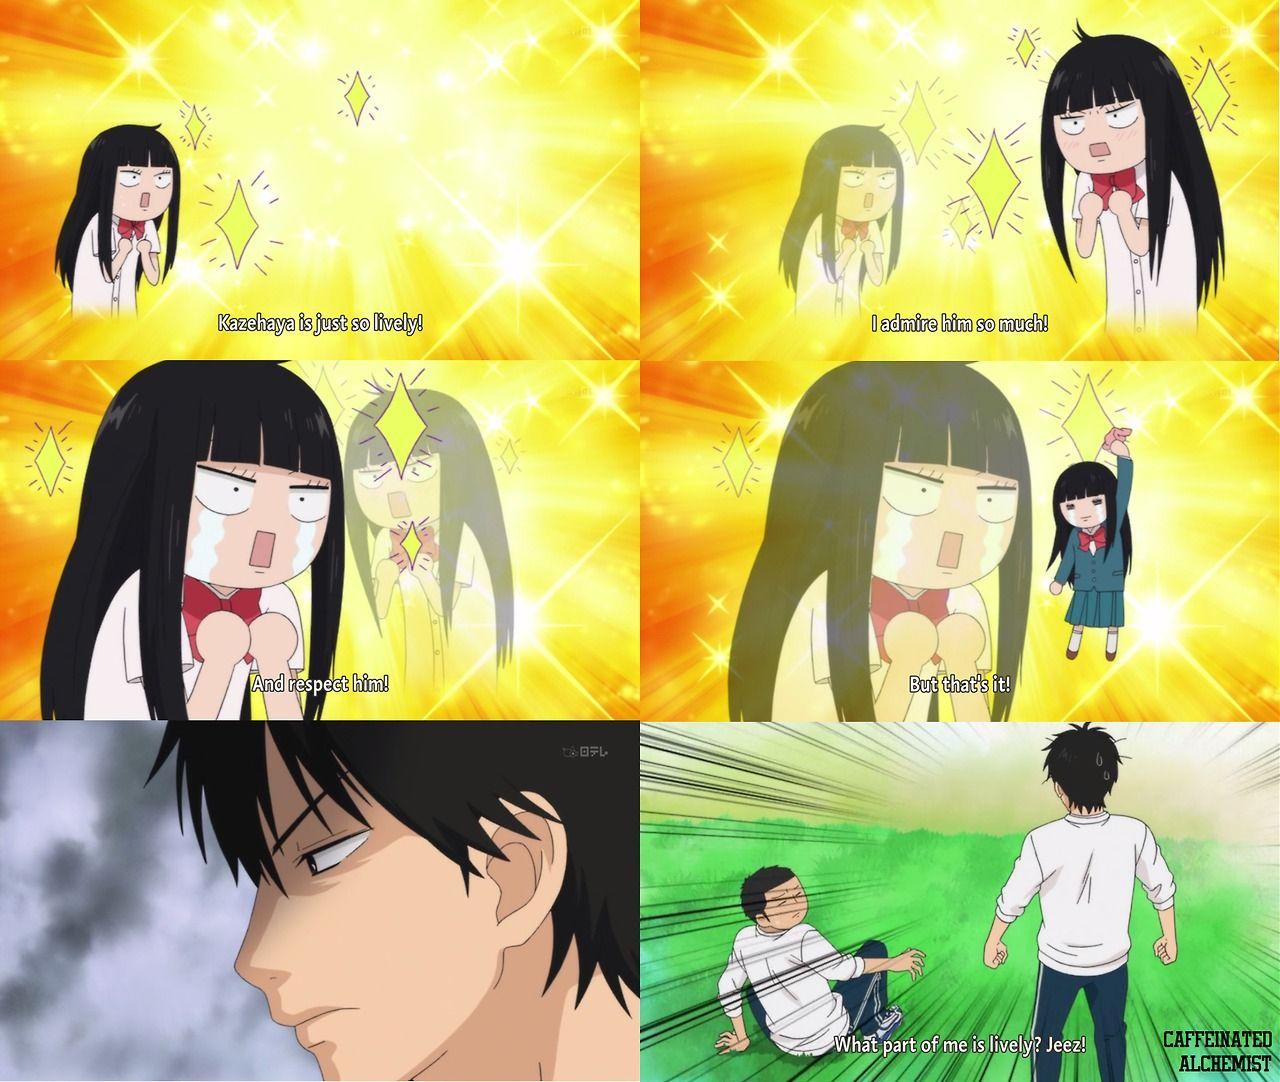 Lively kazehaya shouta kimi ni todoke lovely complex anime